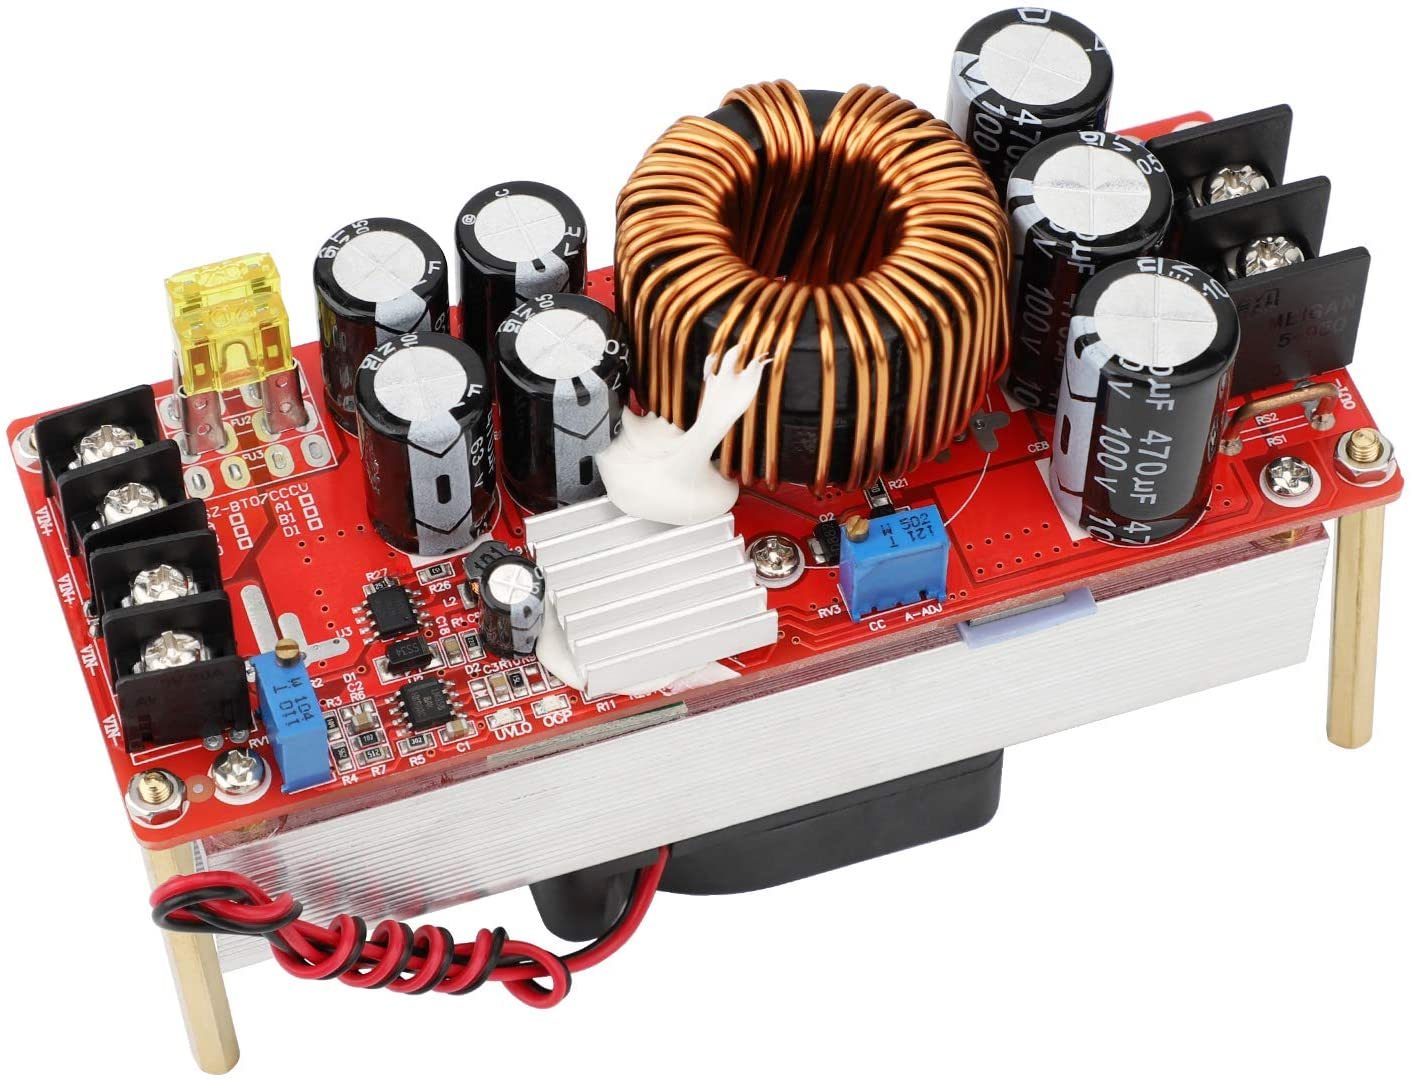 Boost Voltage Converter, DROK 1500W Voltage Regulator Booster DC 10-60V Step Up to 12-90V 20A Input Power Supply Module Volt Transformer Circuit Board